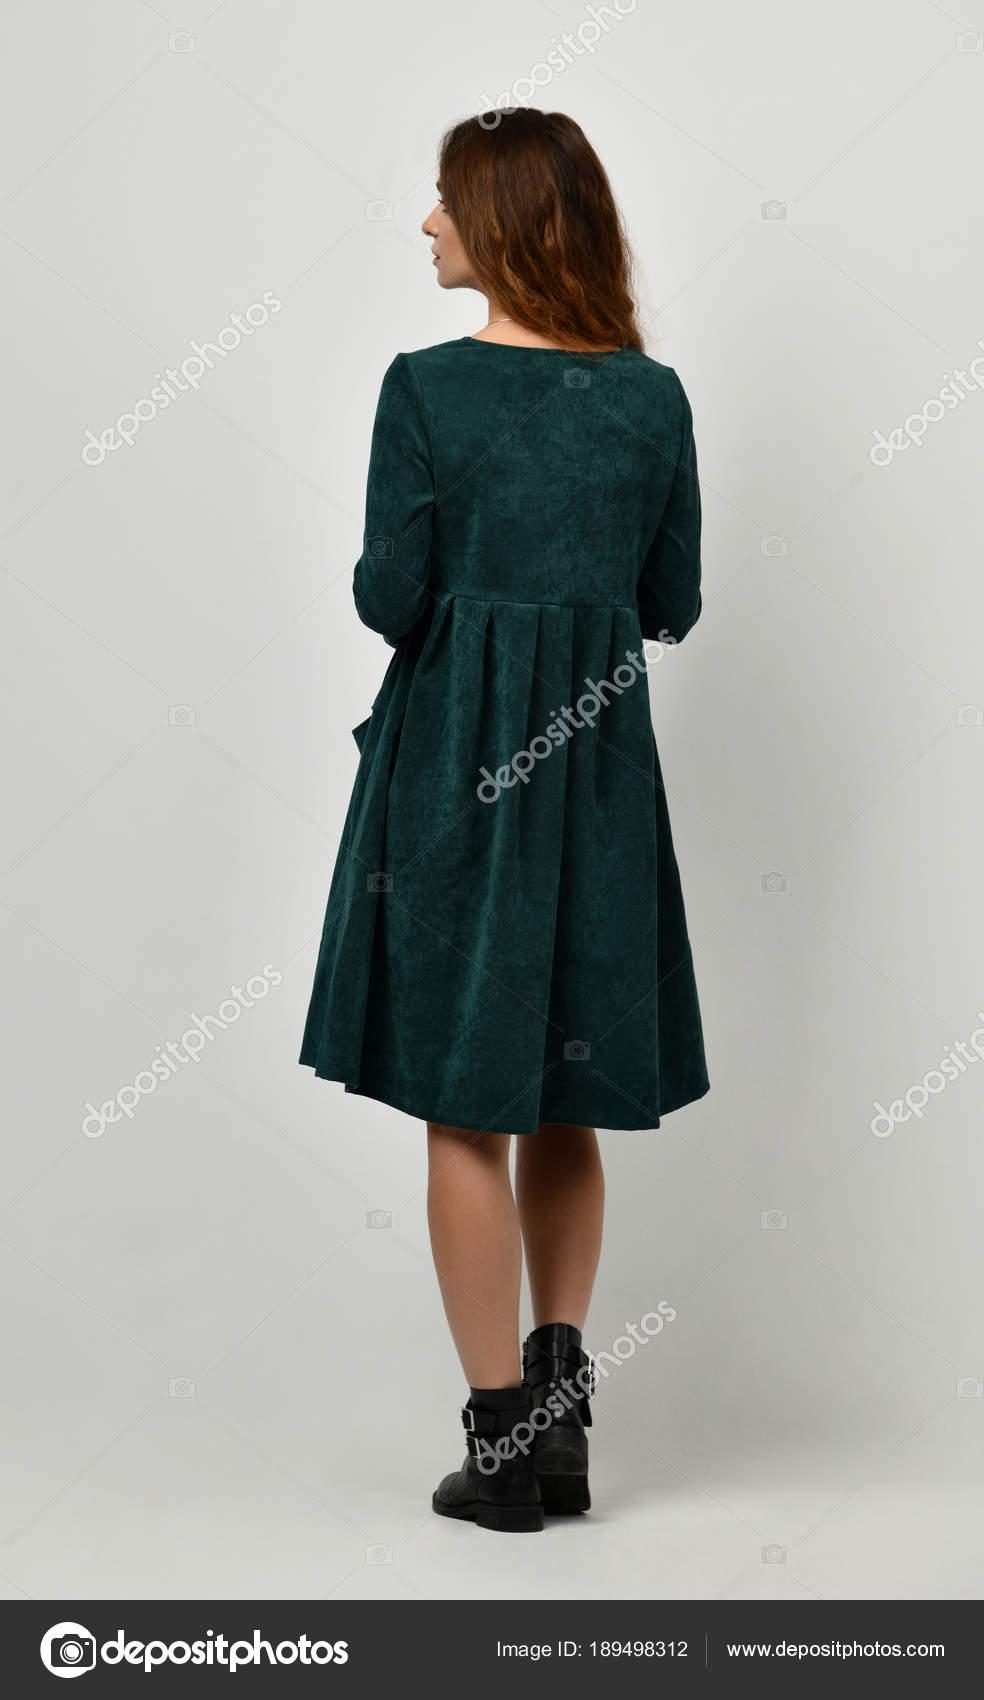 a3b29657607e23 Jonge mooie vrouw poseren in nieuwe casual winter groene jurk op grijs —  Stockfoto